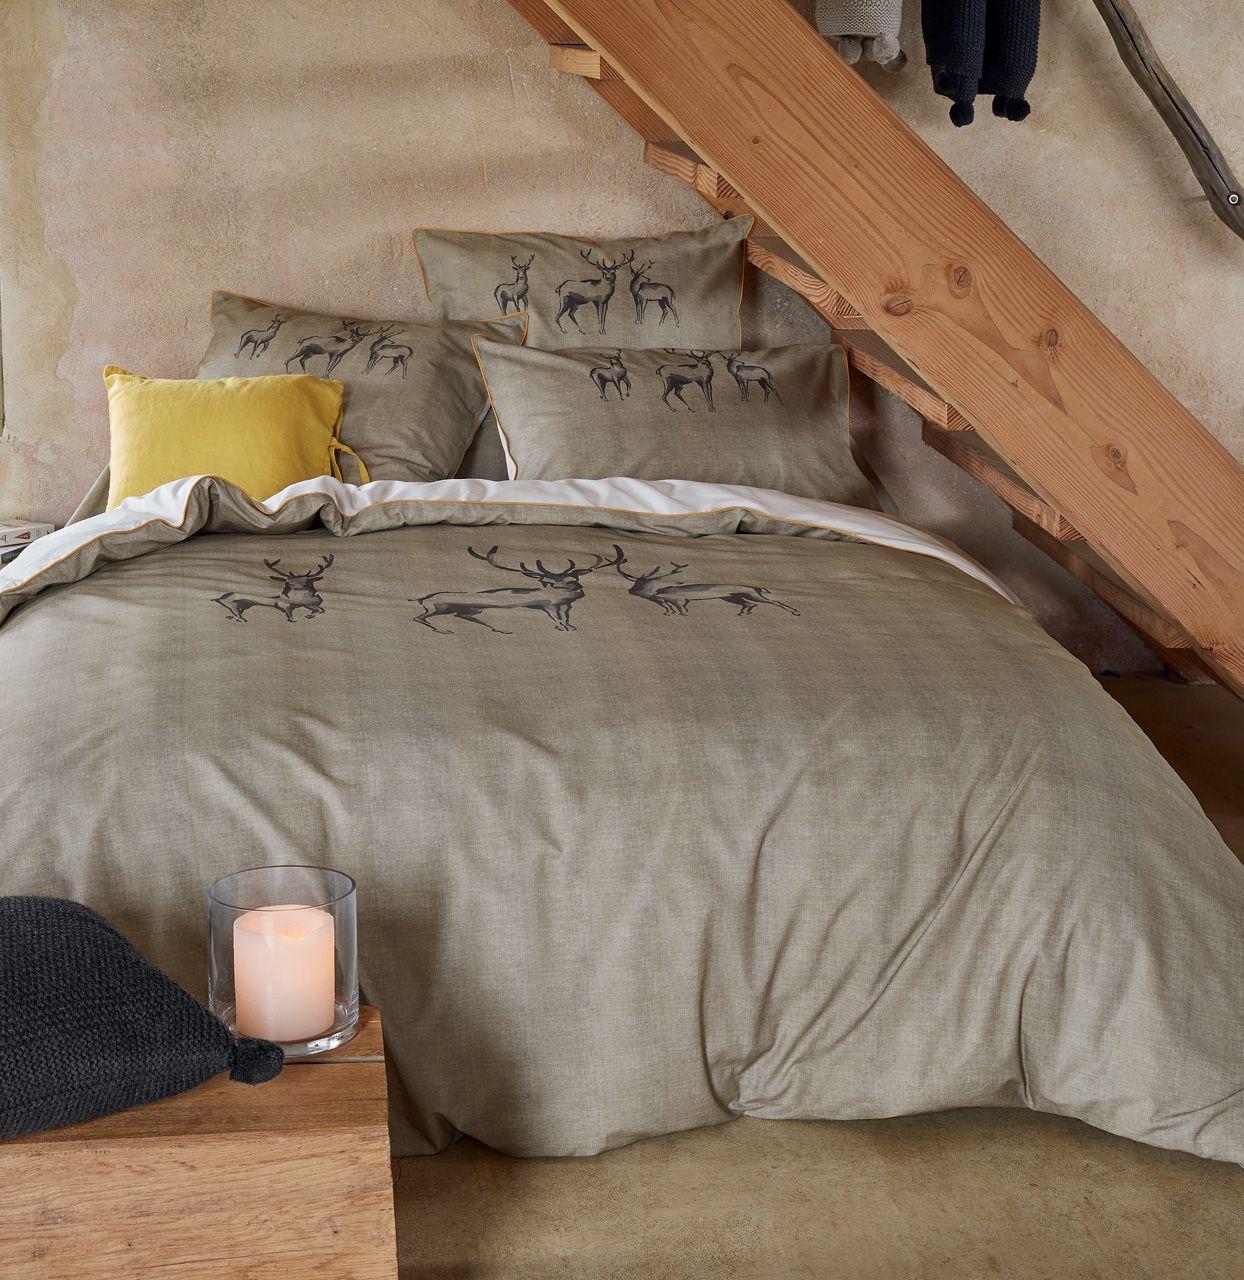 drap housse les 7 vall es impression trame ficelle percale 90x200. Black Bedroom Furniture Sets. Home Design Ideas